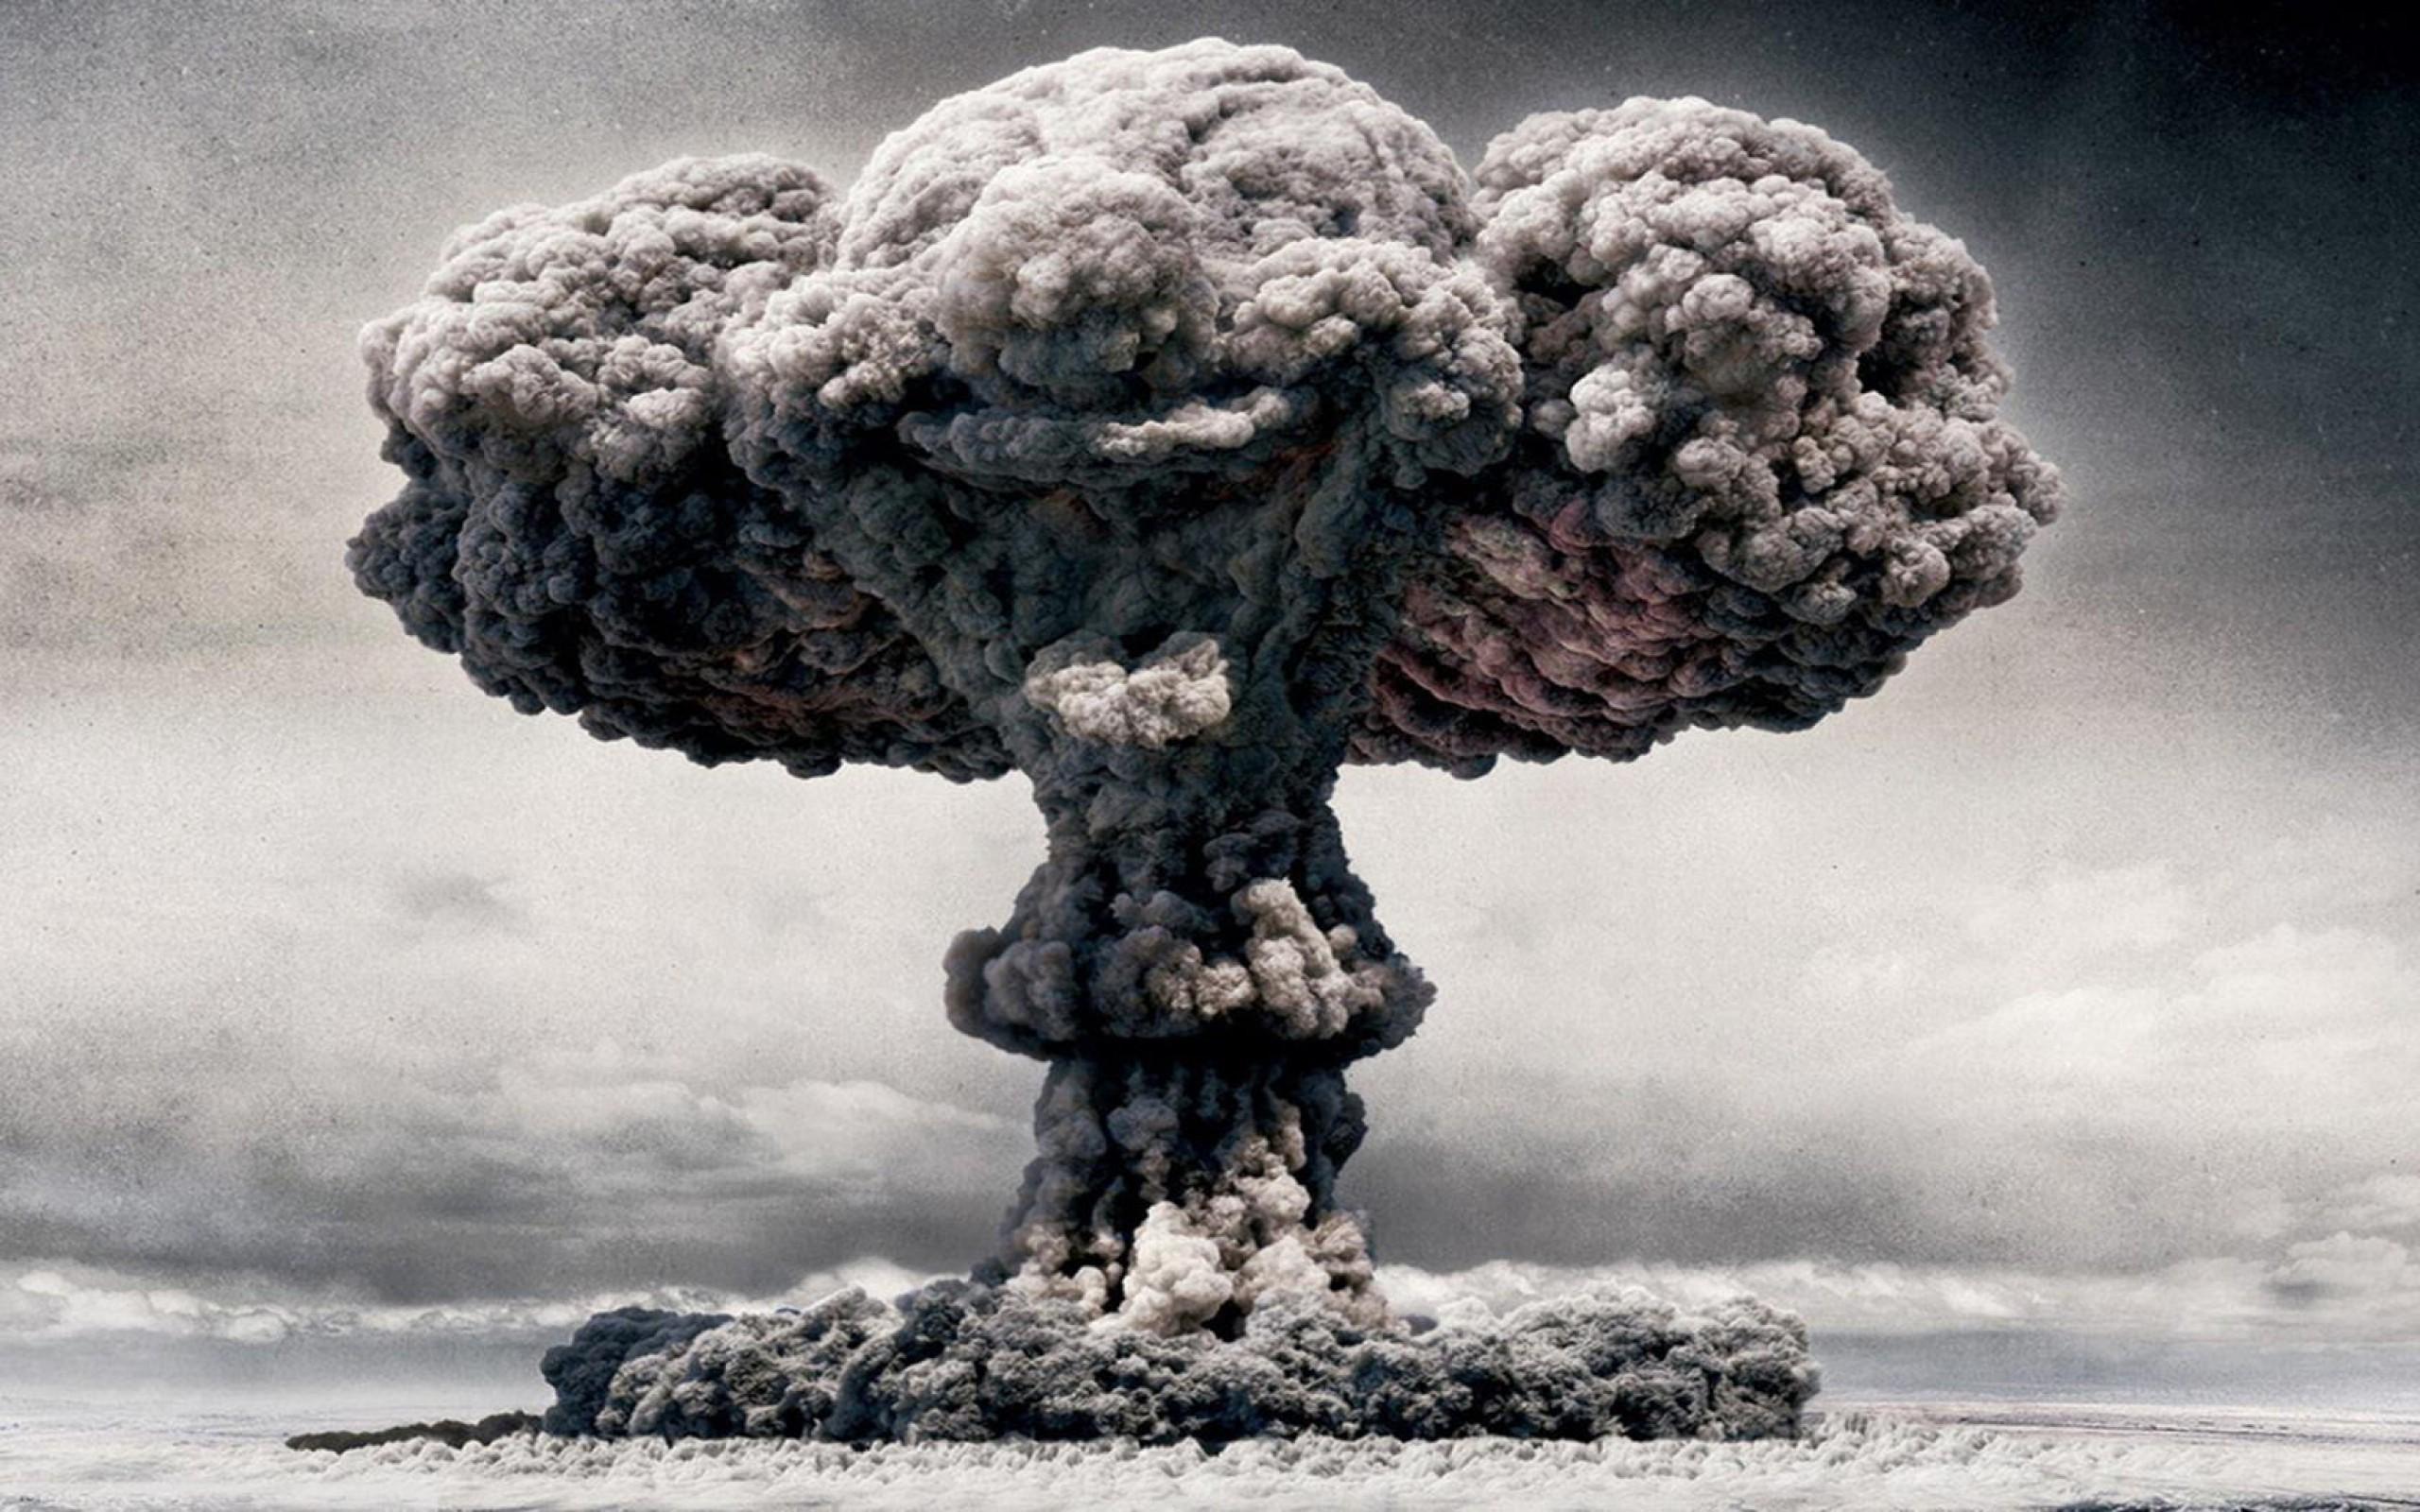 Atomic wallpaper hd images. Bomb clipart hydrogen bomb